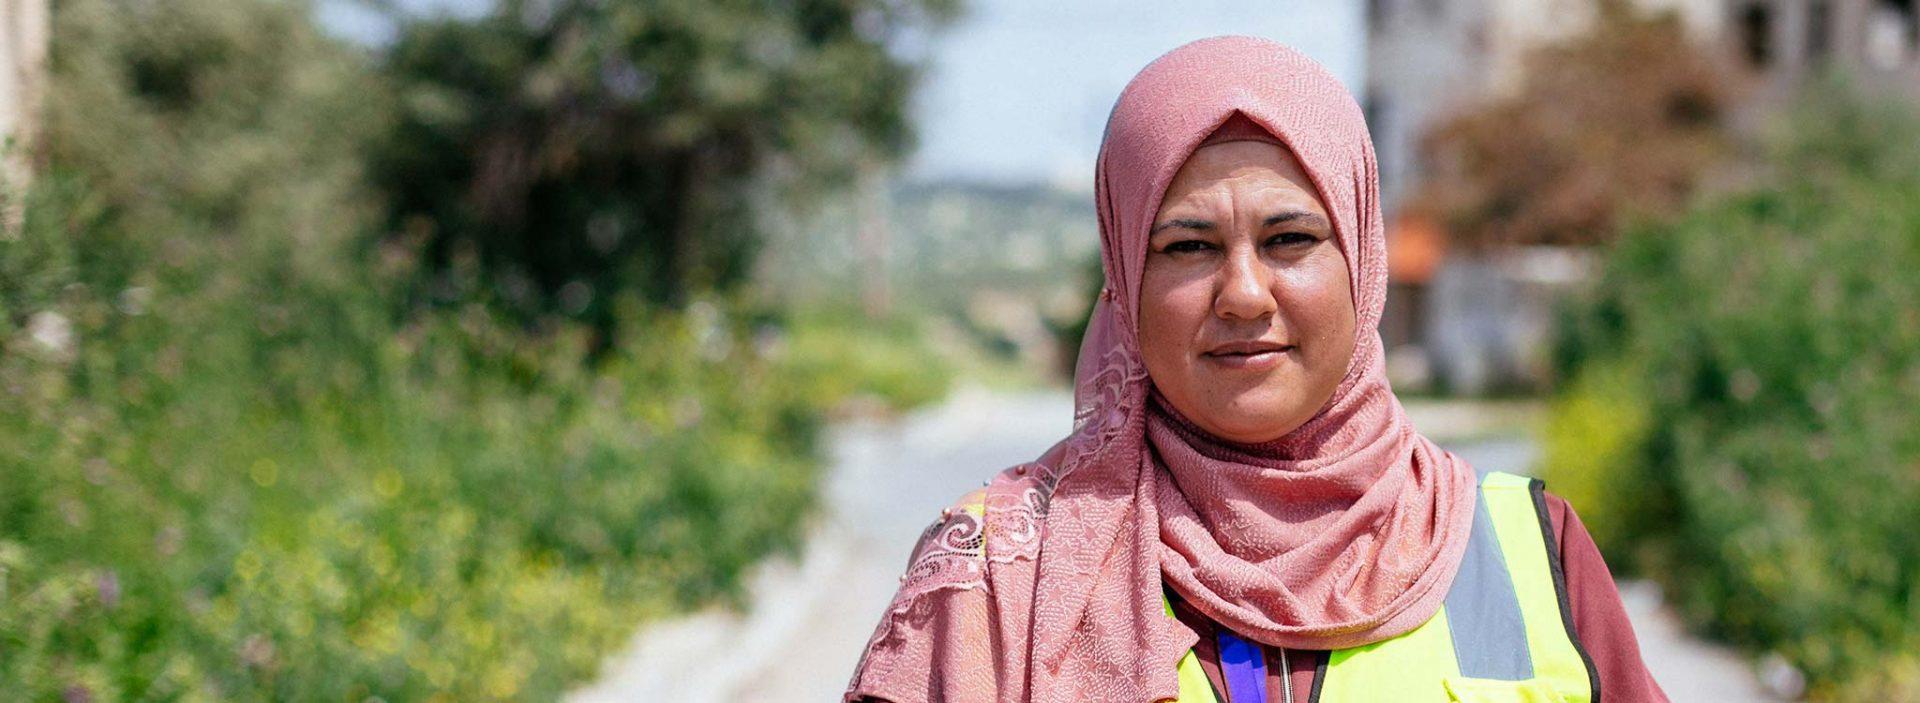 An Action Against Hunger member of staff in Jordan.